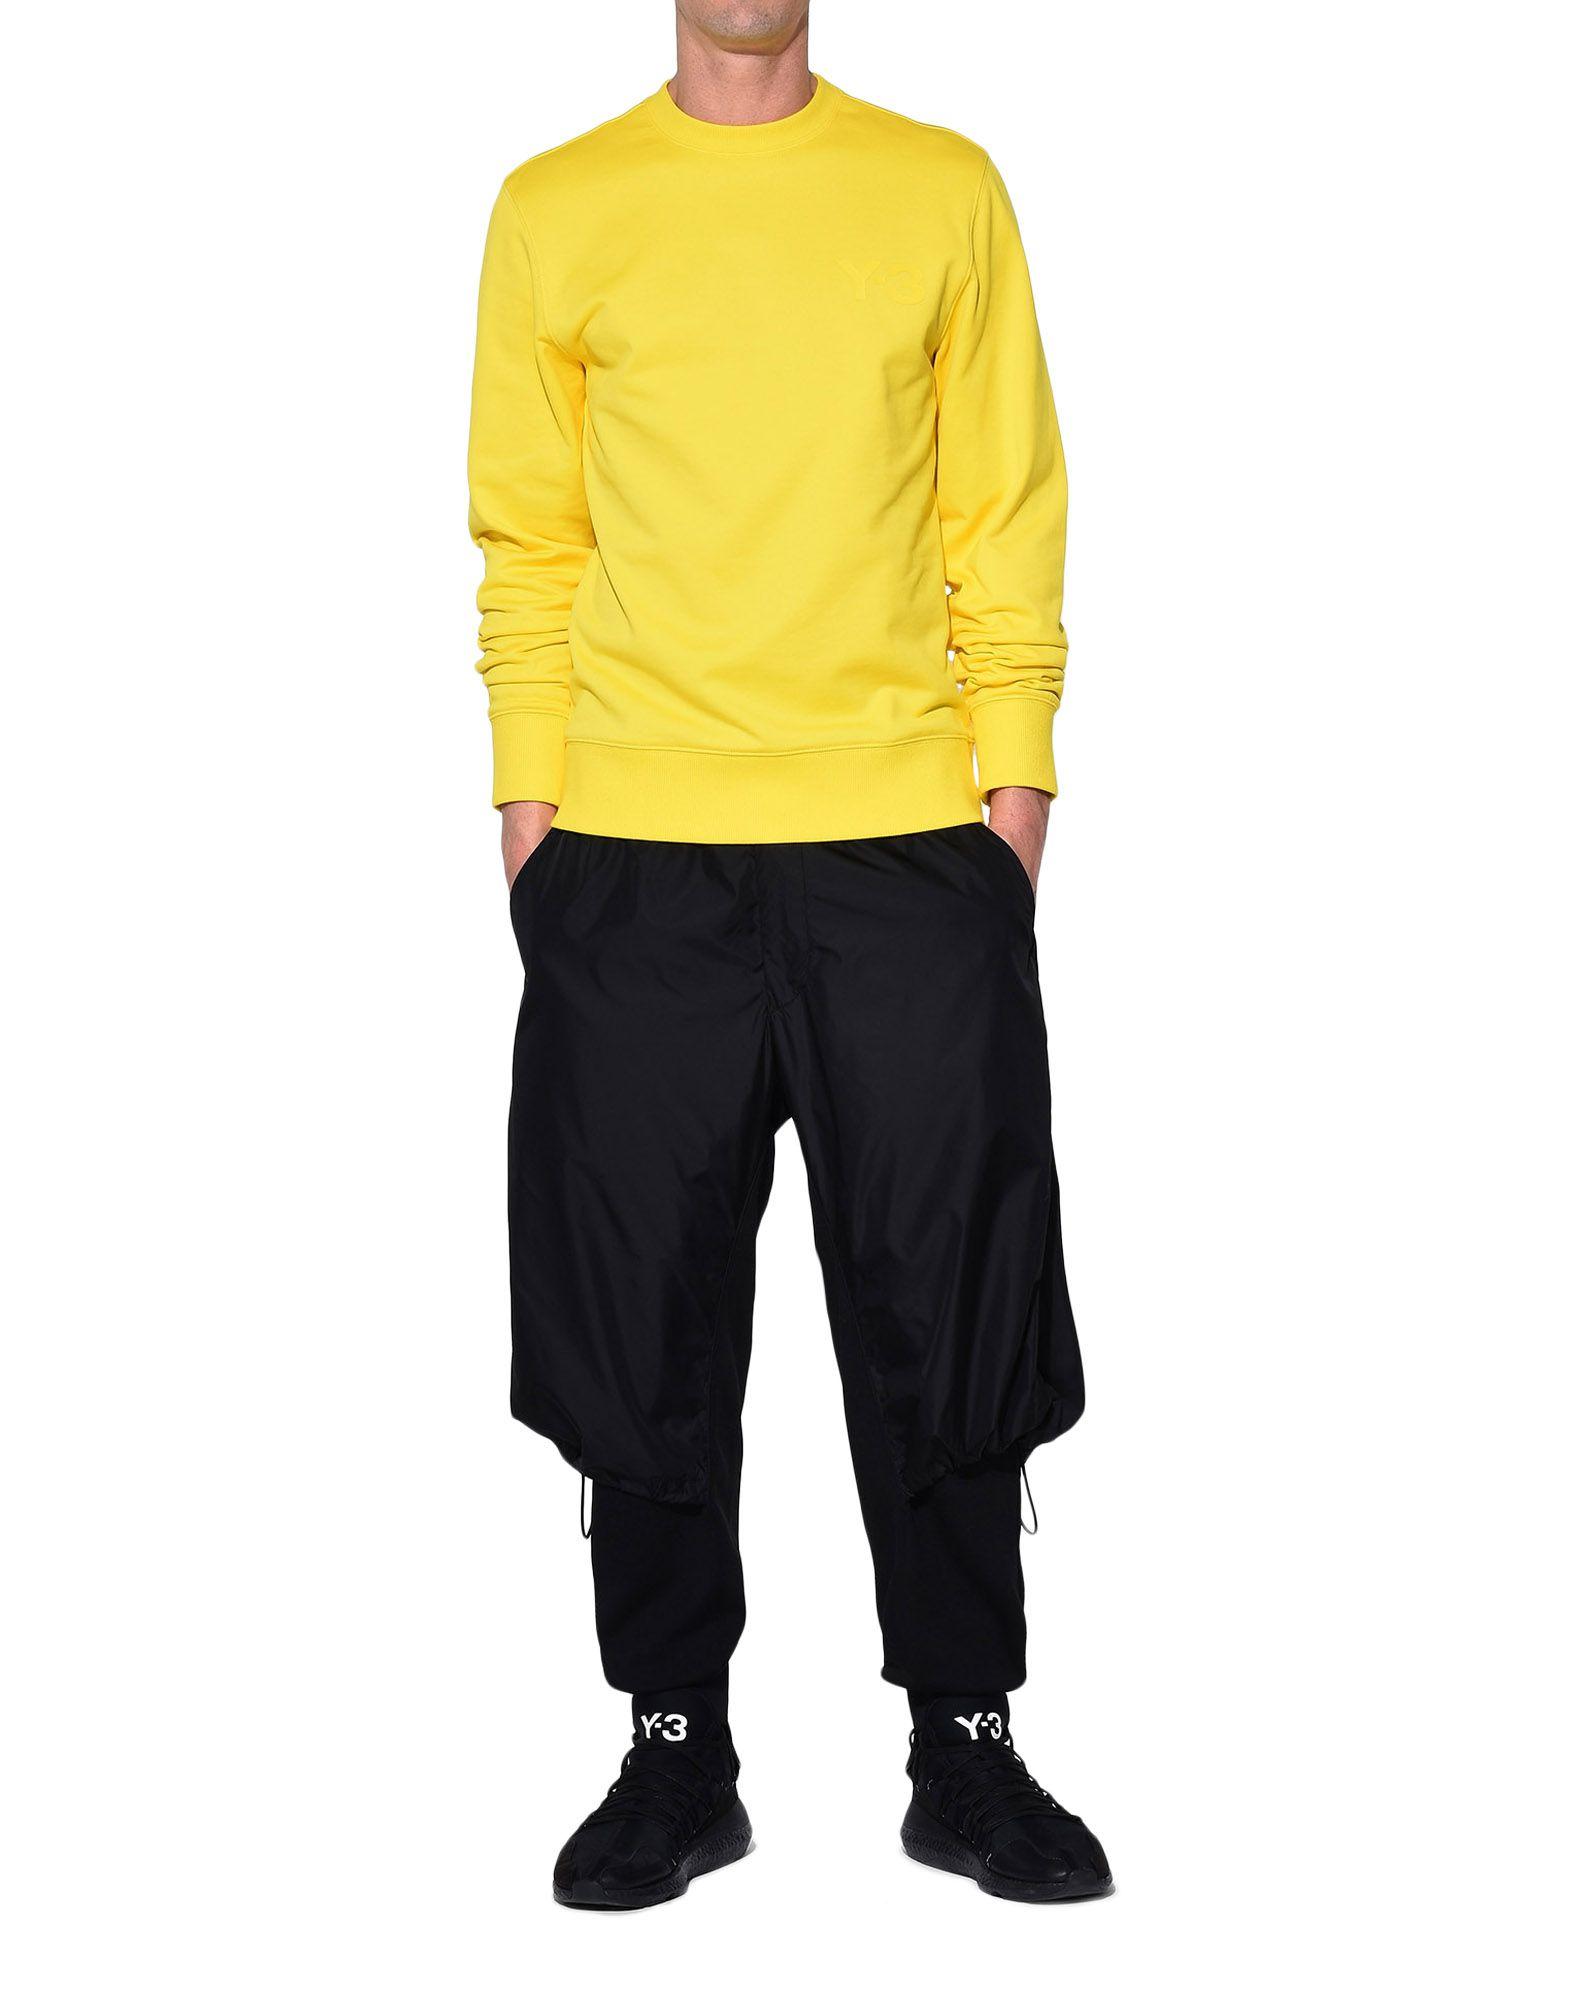 Y-3 Y-3 Classic Sweater スウェット メンズ a